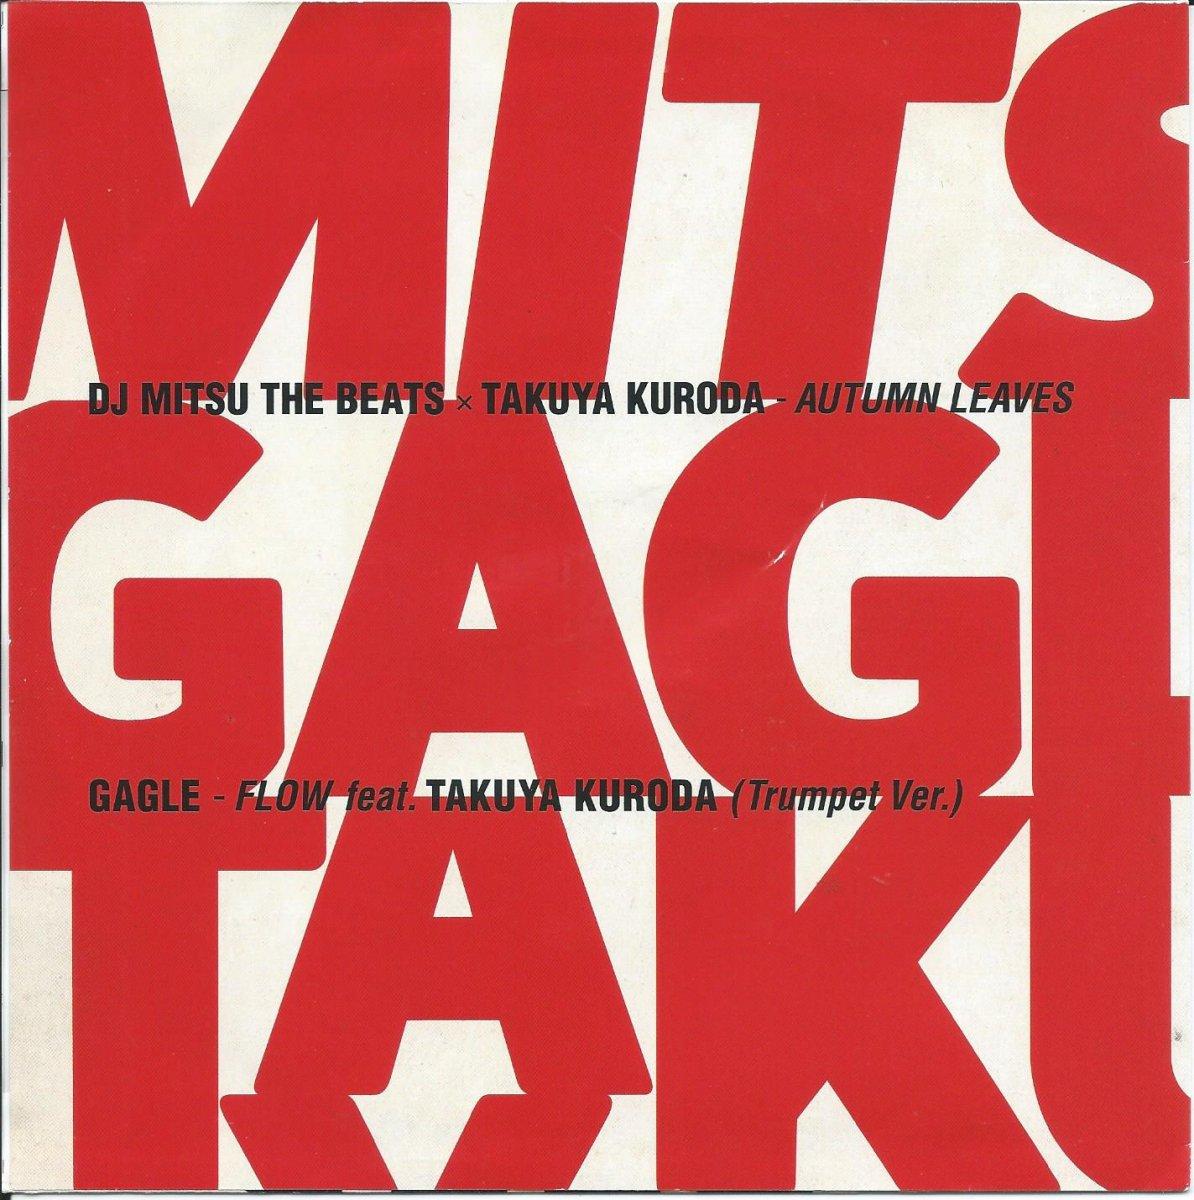 DJ MITSU THE BEATS X TAKUYA KURODA (黒田卓也) / AUTUMN LEAVES (7